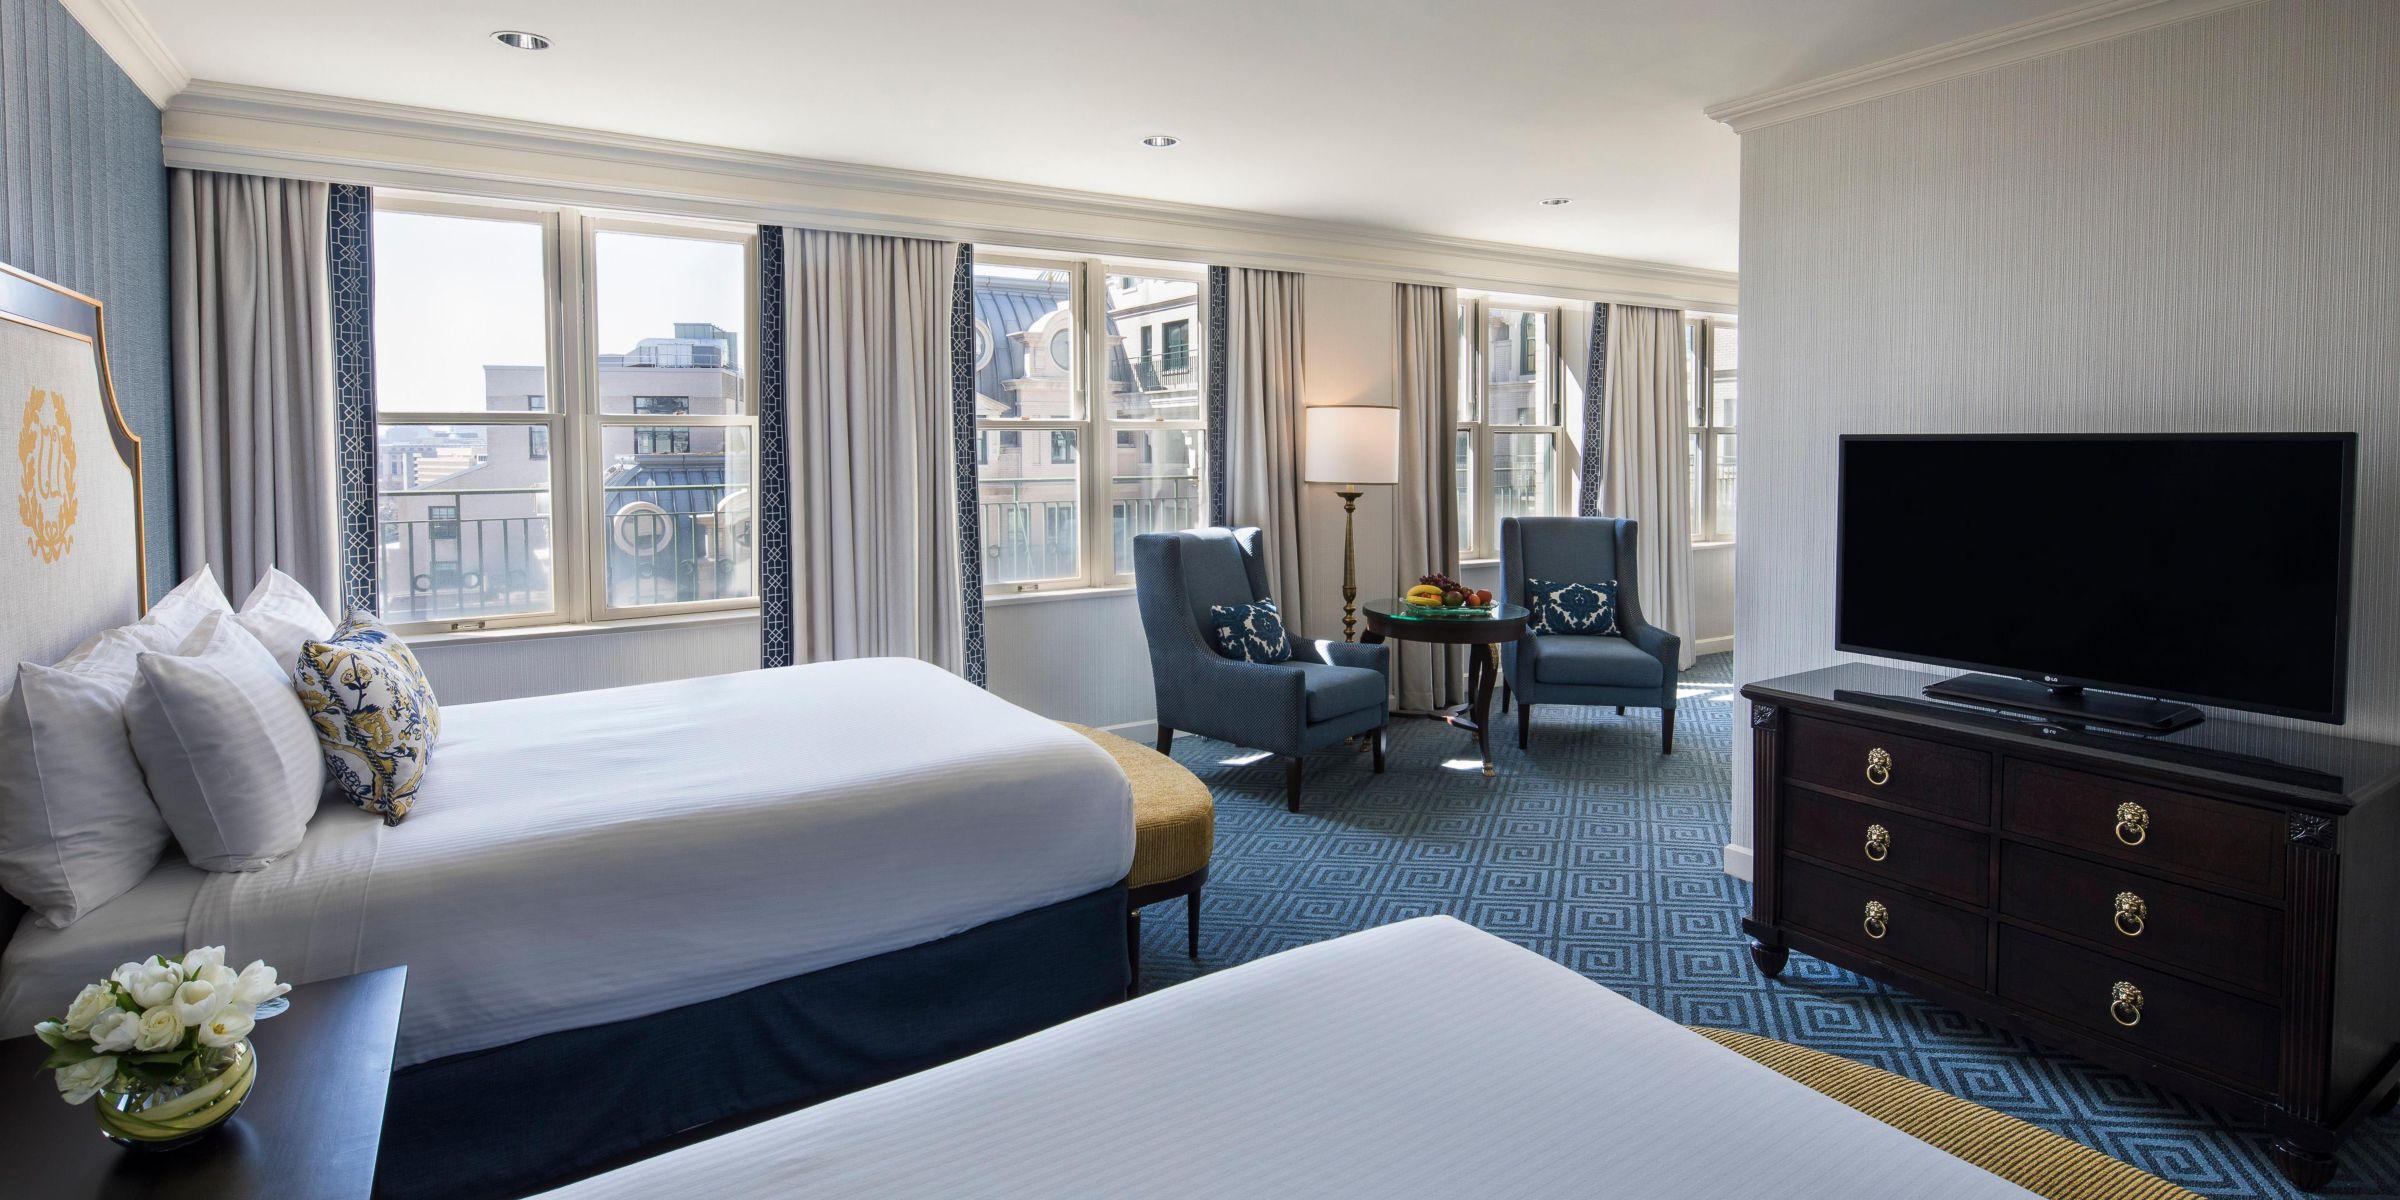 Luxury Hotels In Dc Intercontinental The Willard Hotel Washington